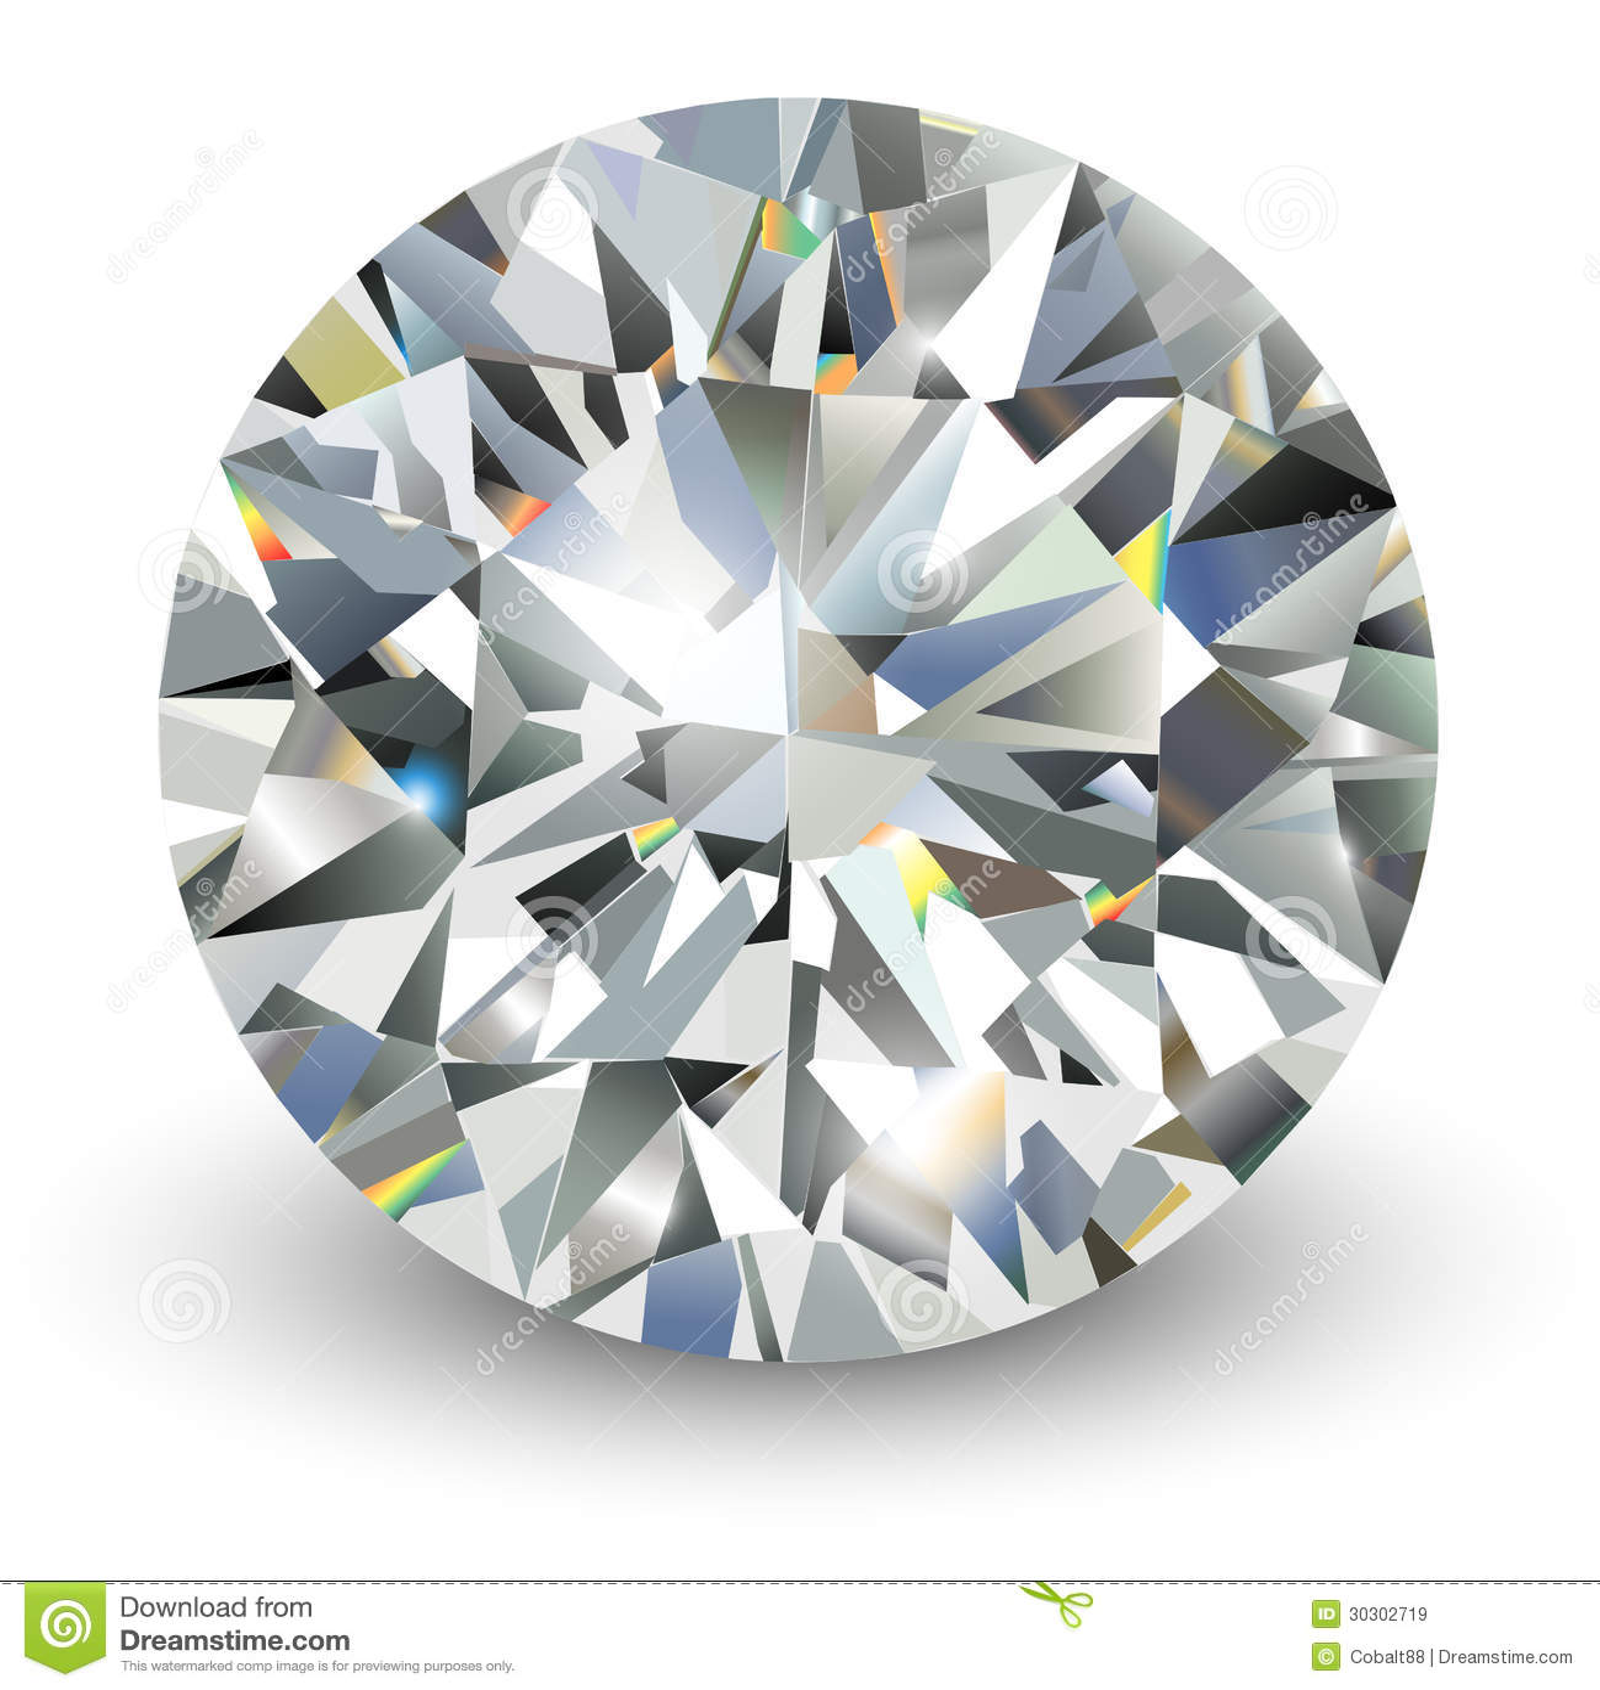 Diamond Royalty Free Stock Images Image 30302719